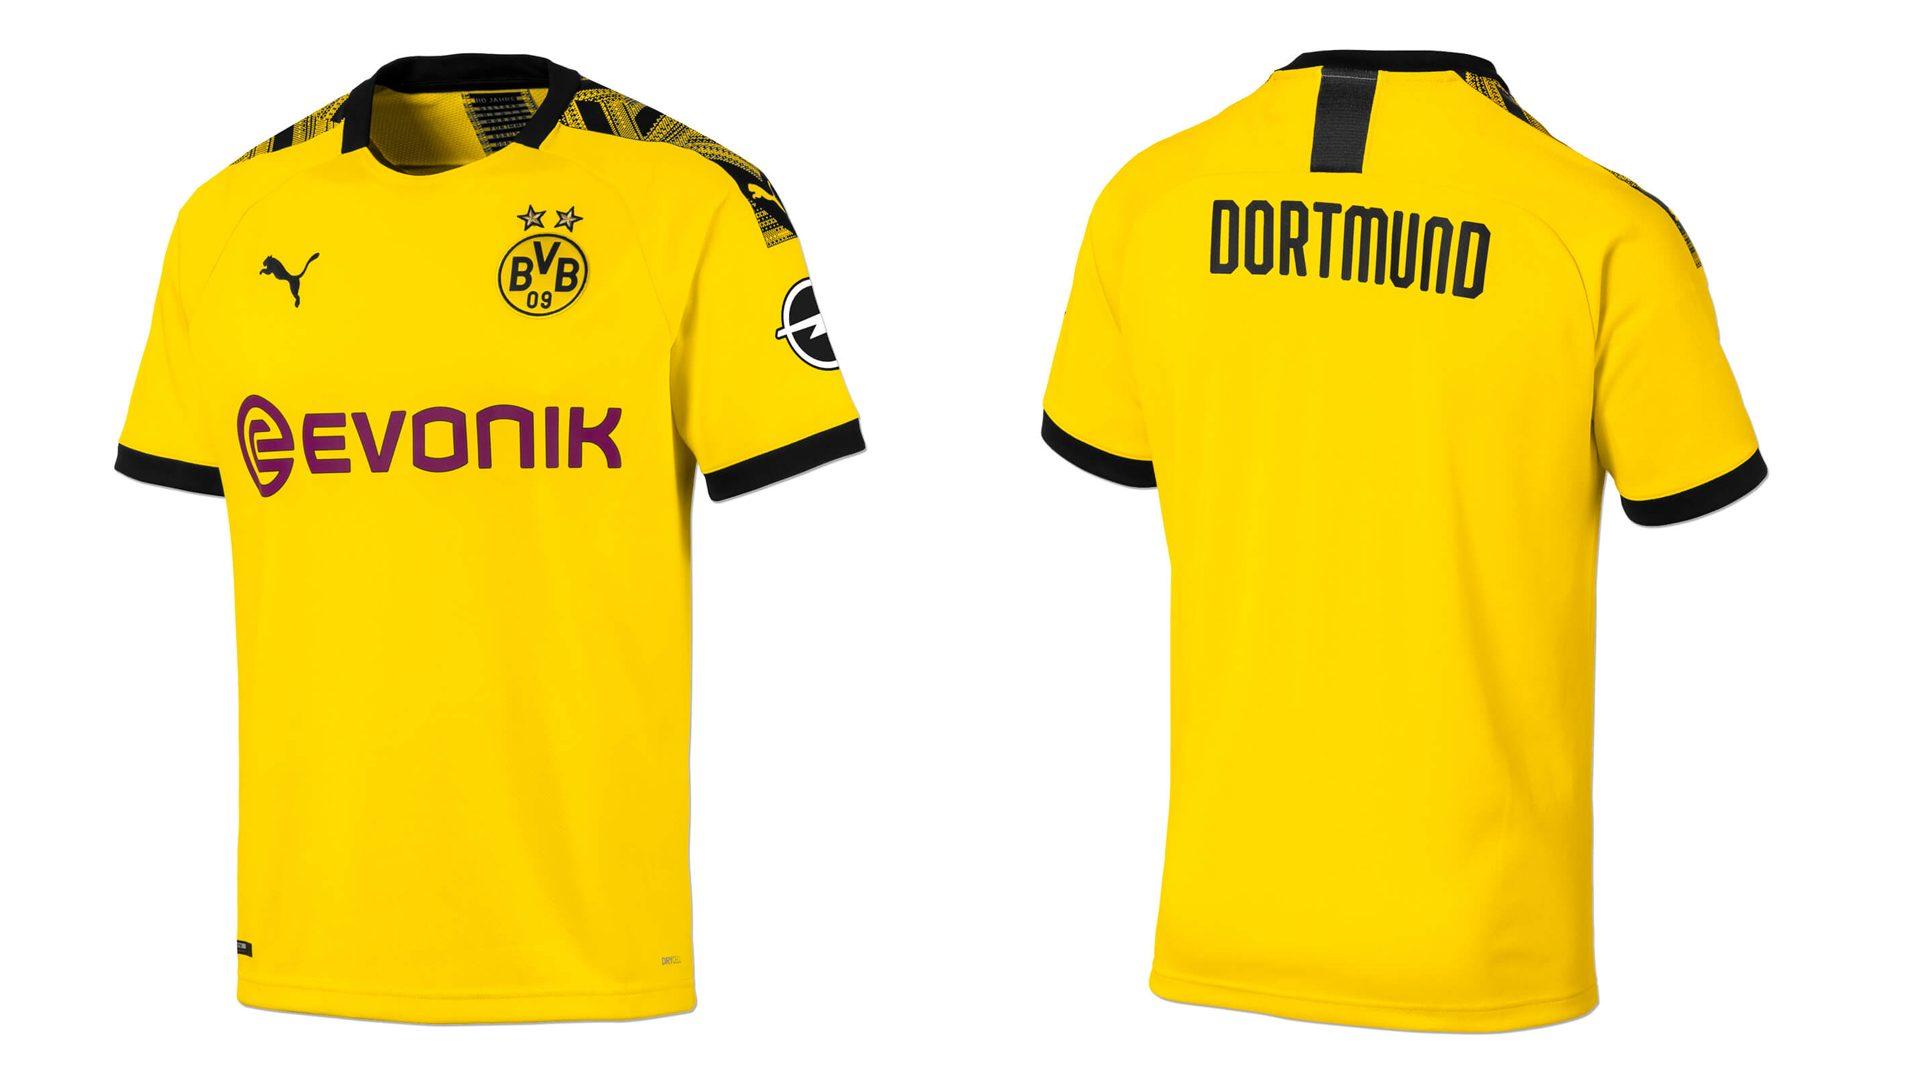 Bundesliga Borussia Dortmund Release New Jersey For 2019 20